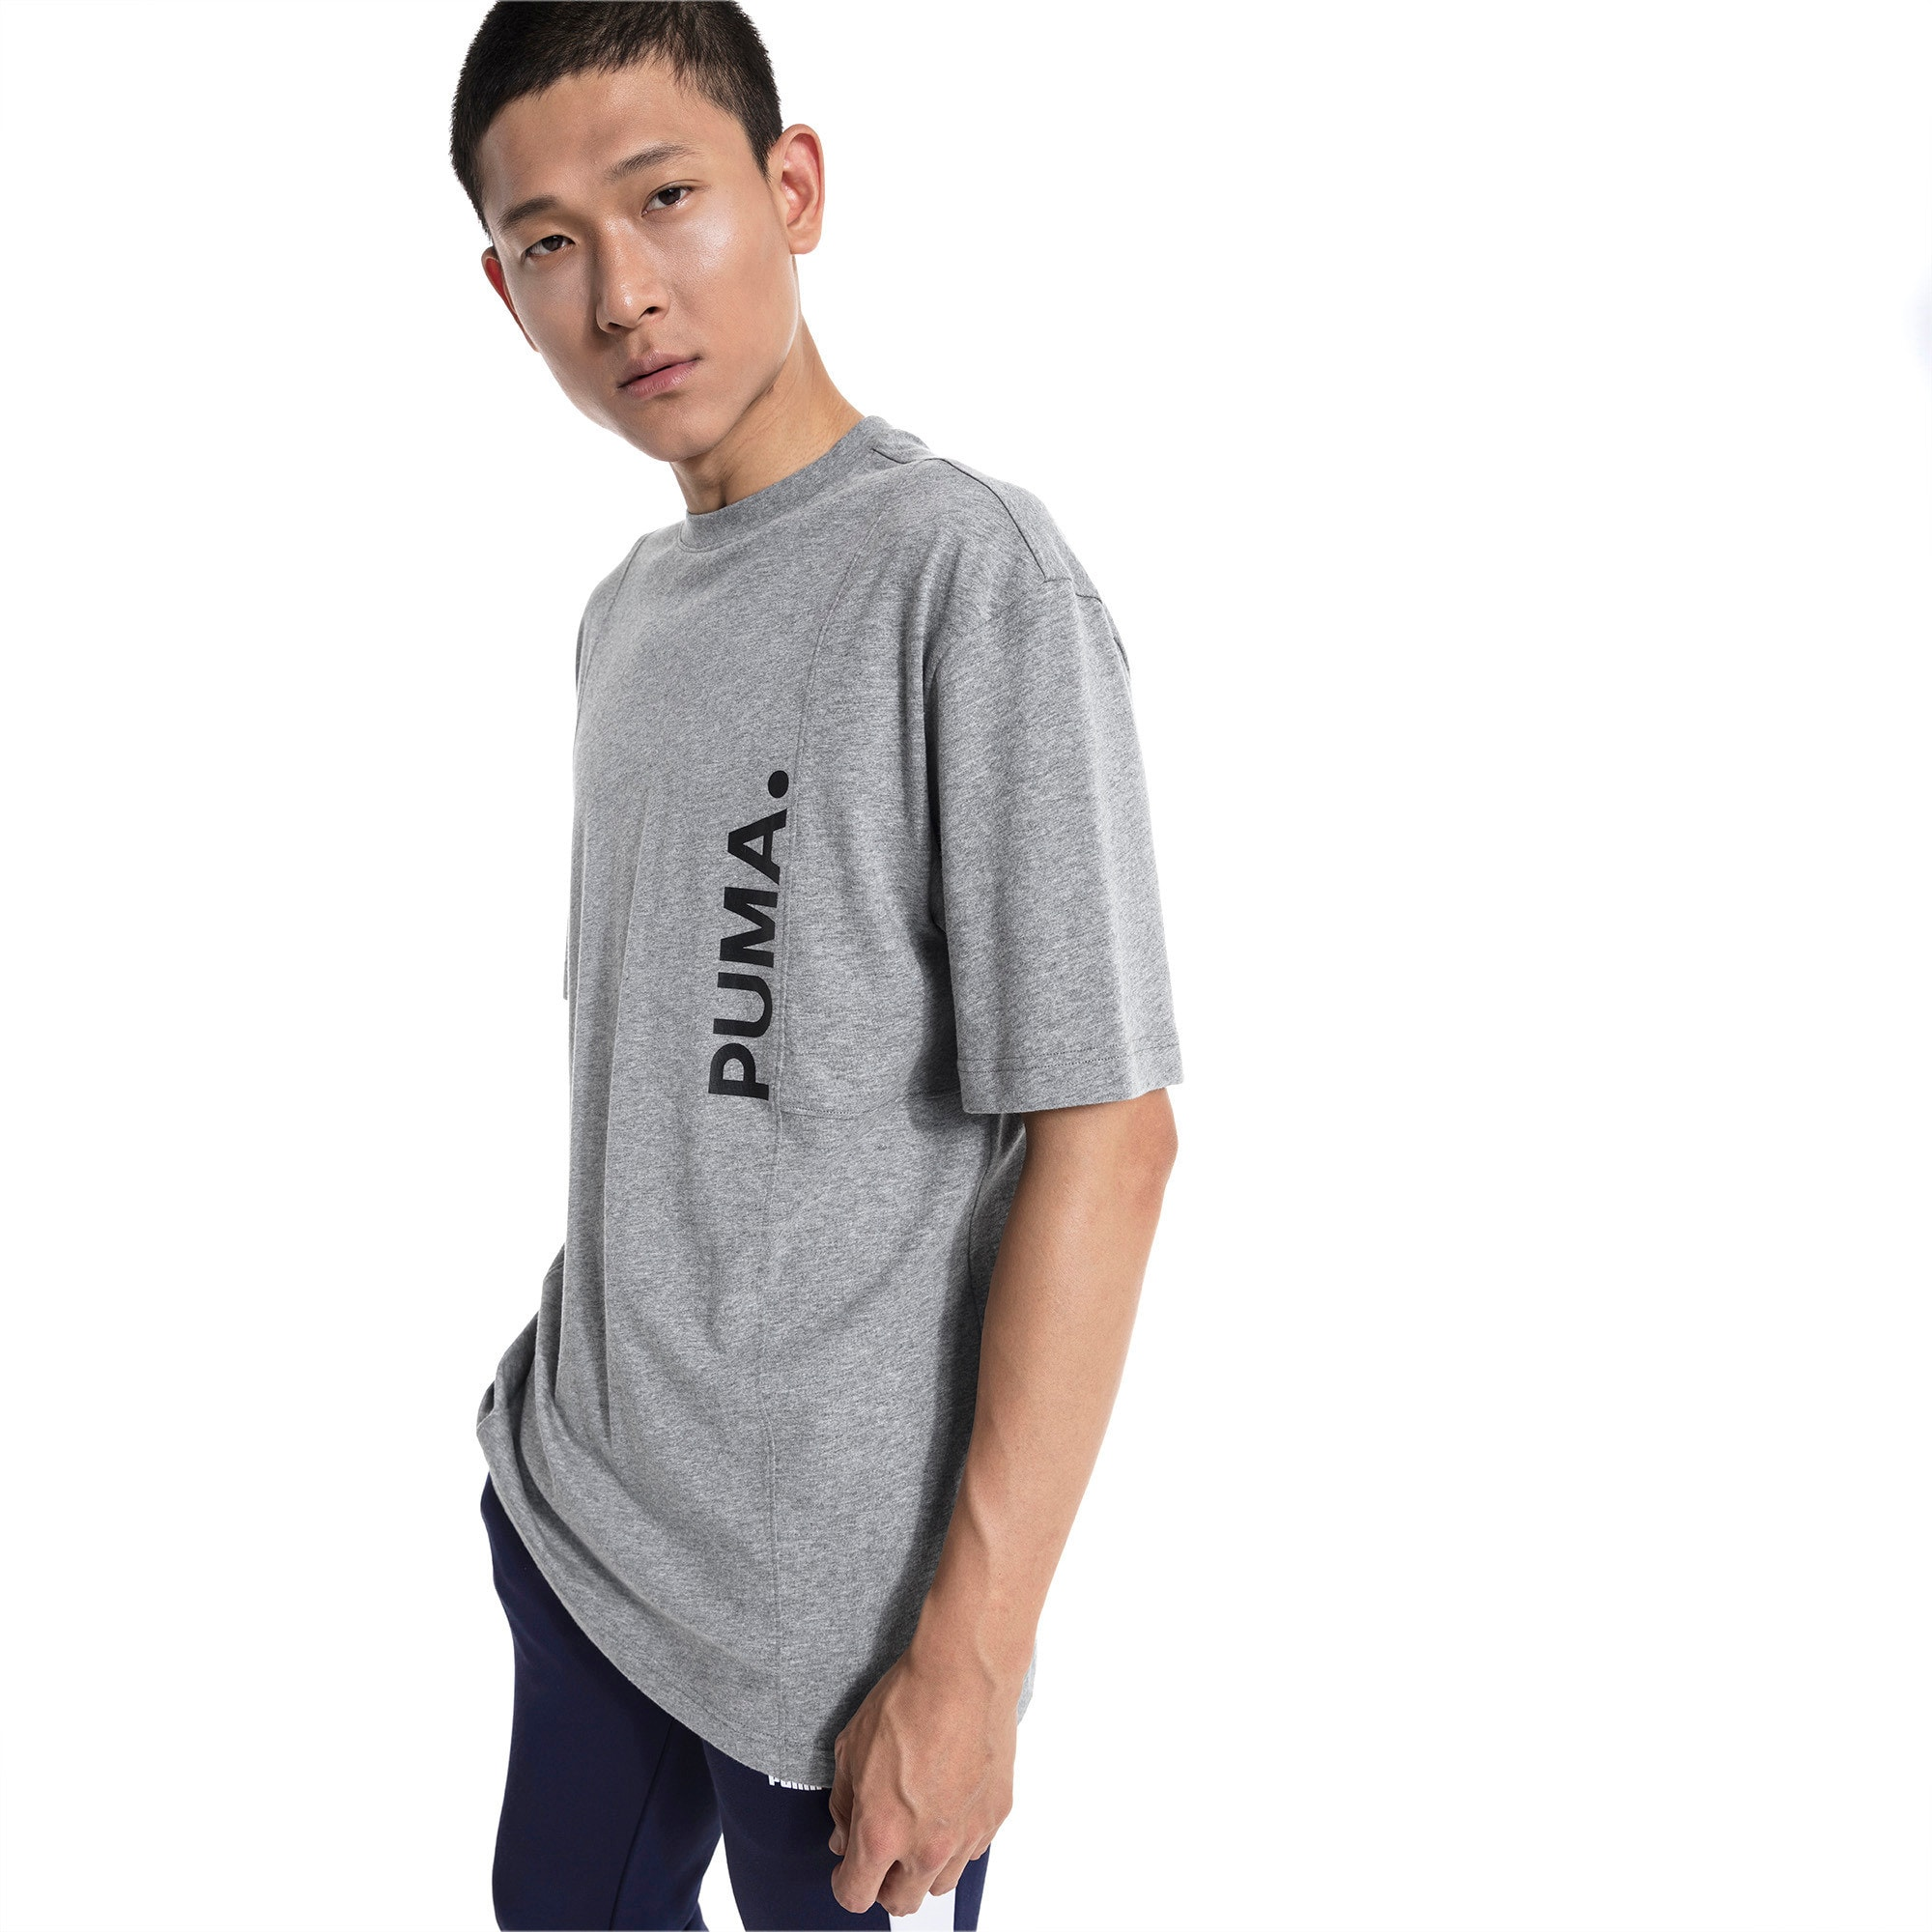 Thumbnail 1 of T-Shirt Epoch pour homme, Medium Gray Heather, medium